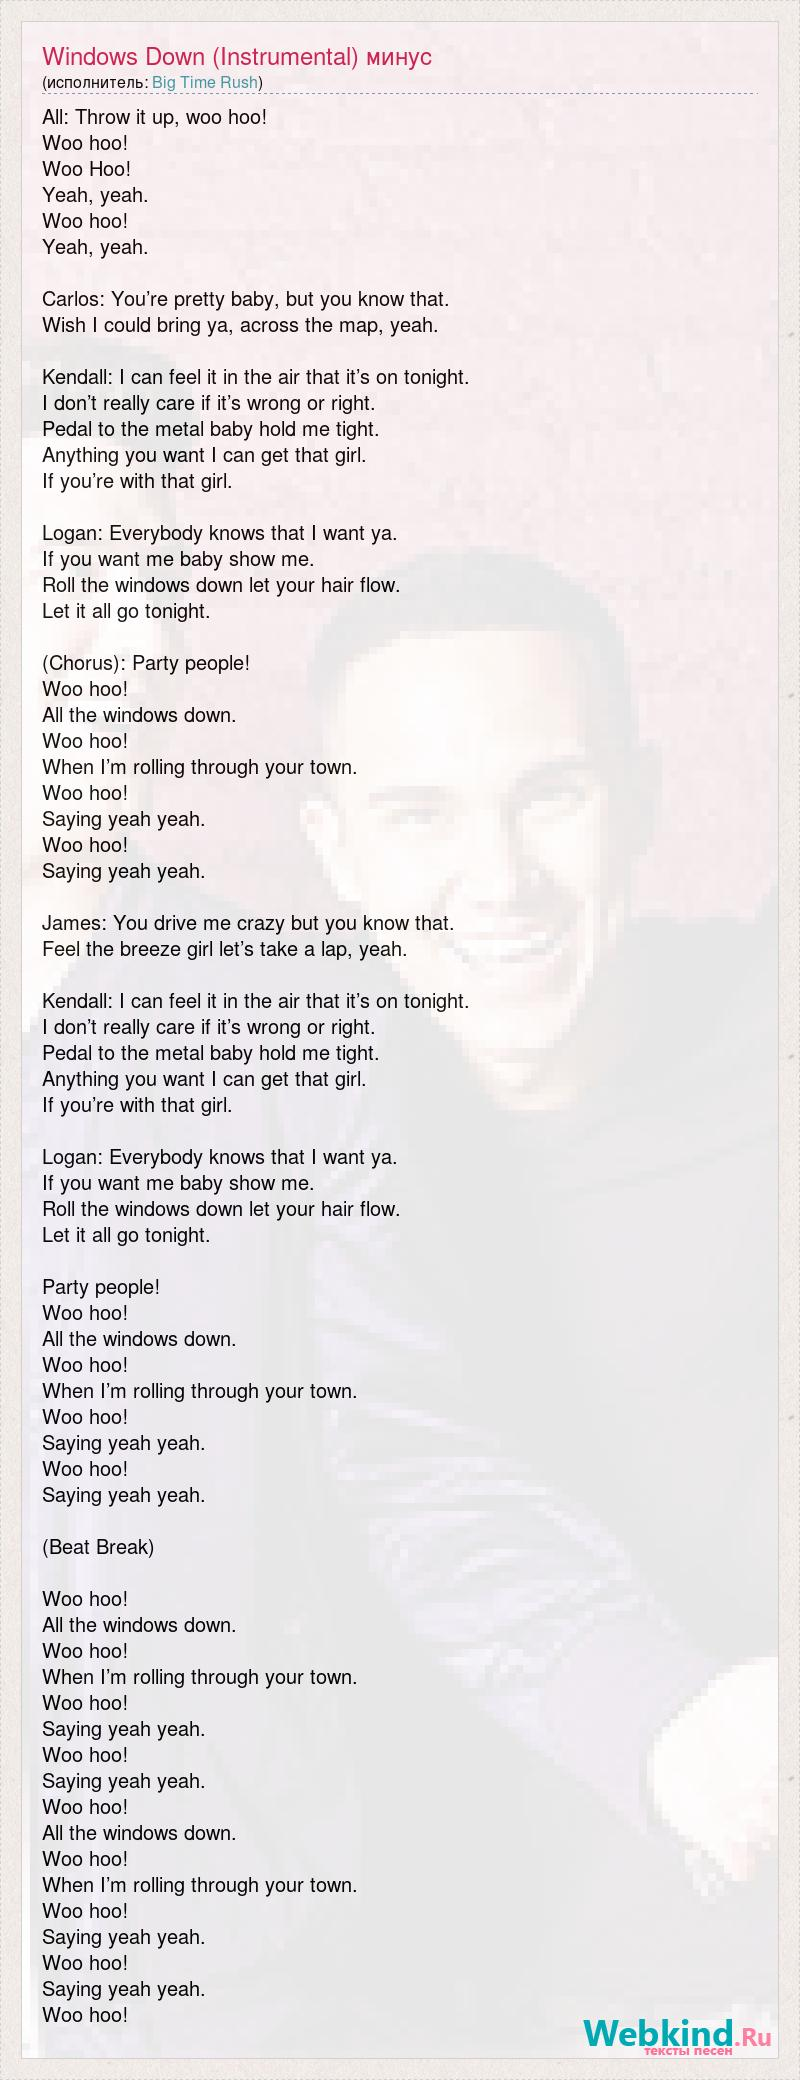 Big Time Rush: Windows Down (Instrumental) минус слова песни